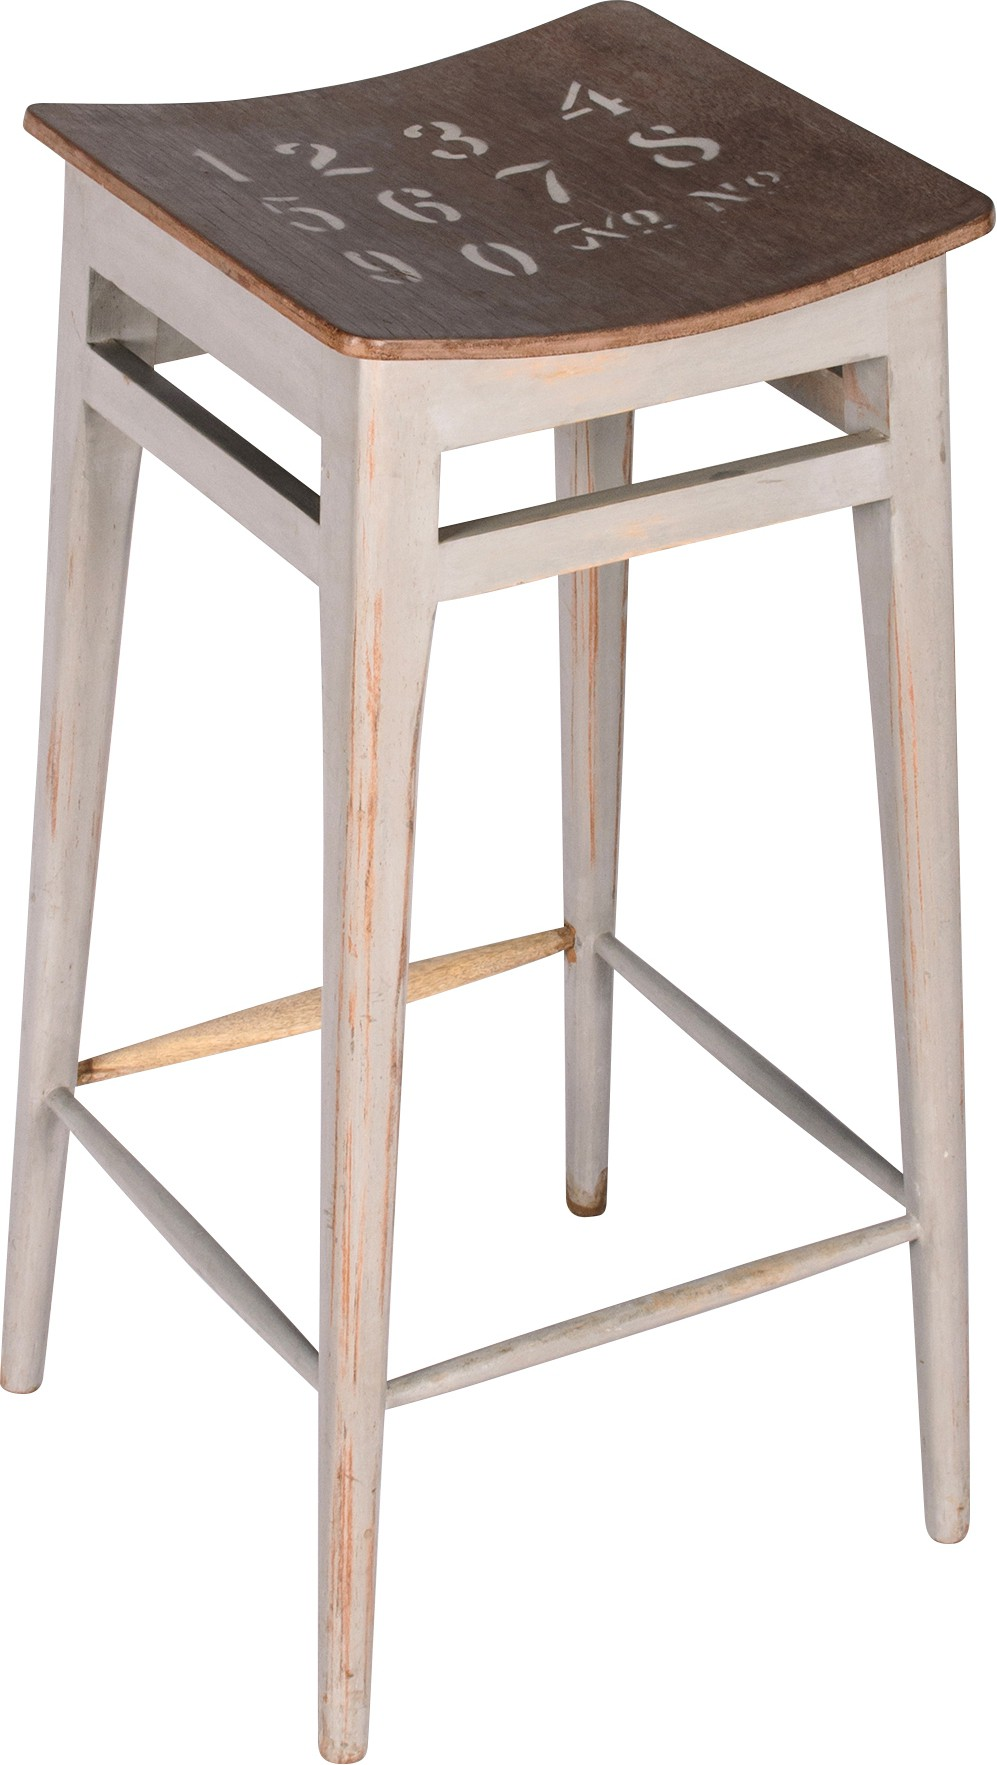 View Hastkala Solid Wood Bar Stool(Finish Color - Brown) Furniture (Hastkala)